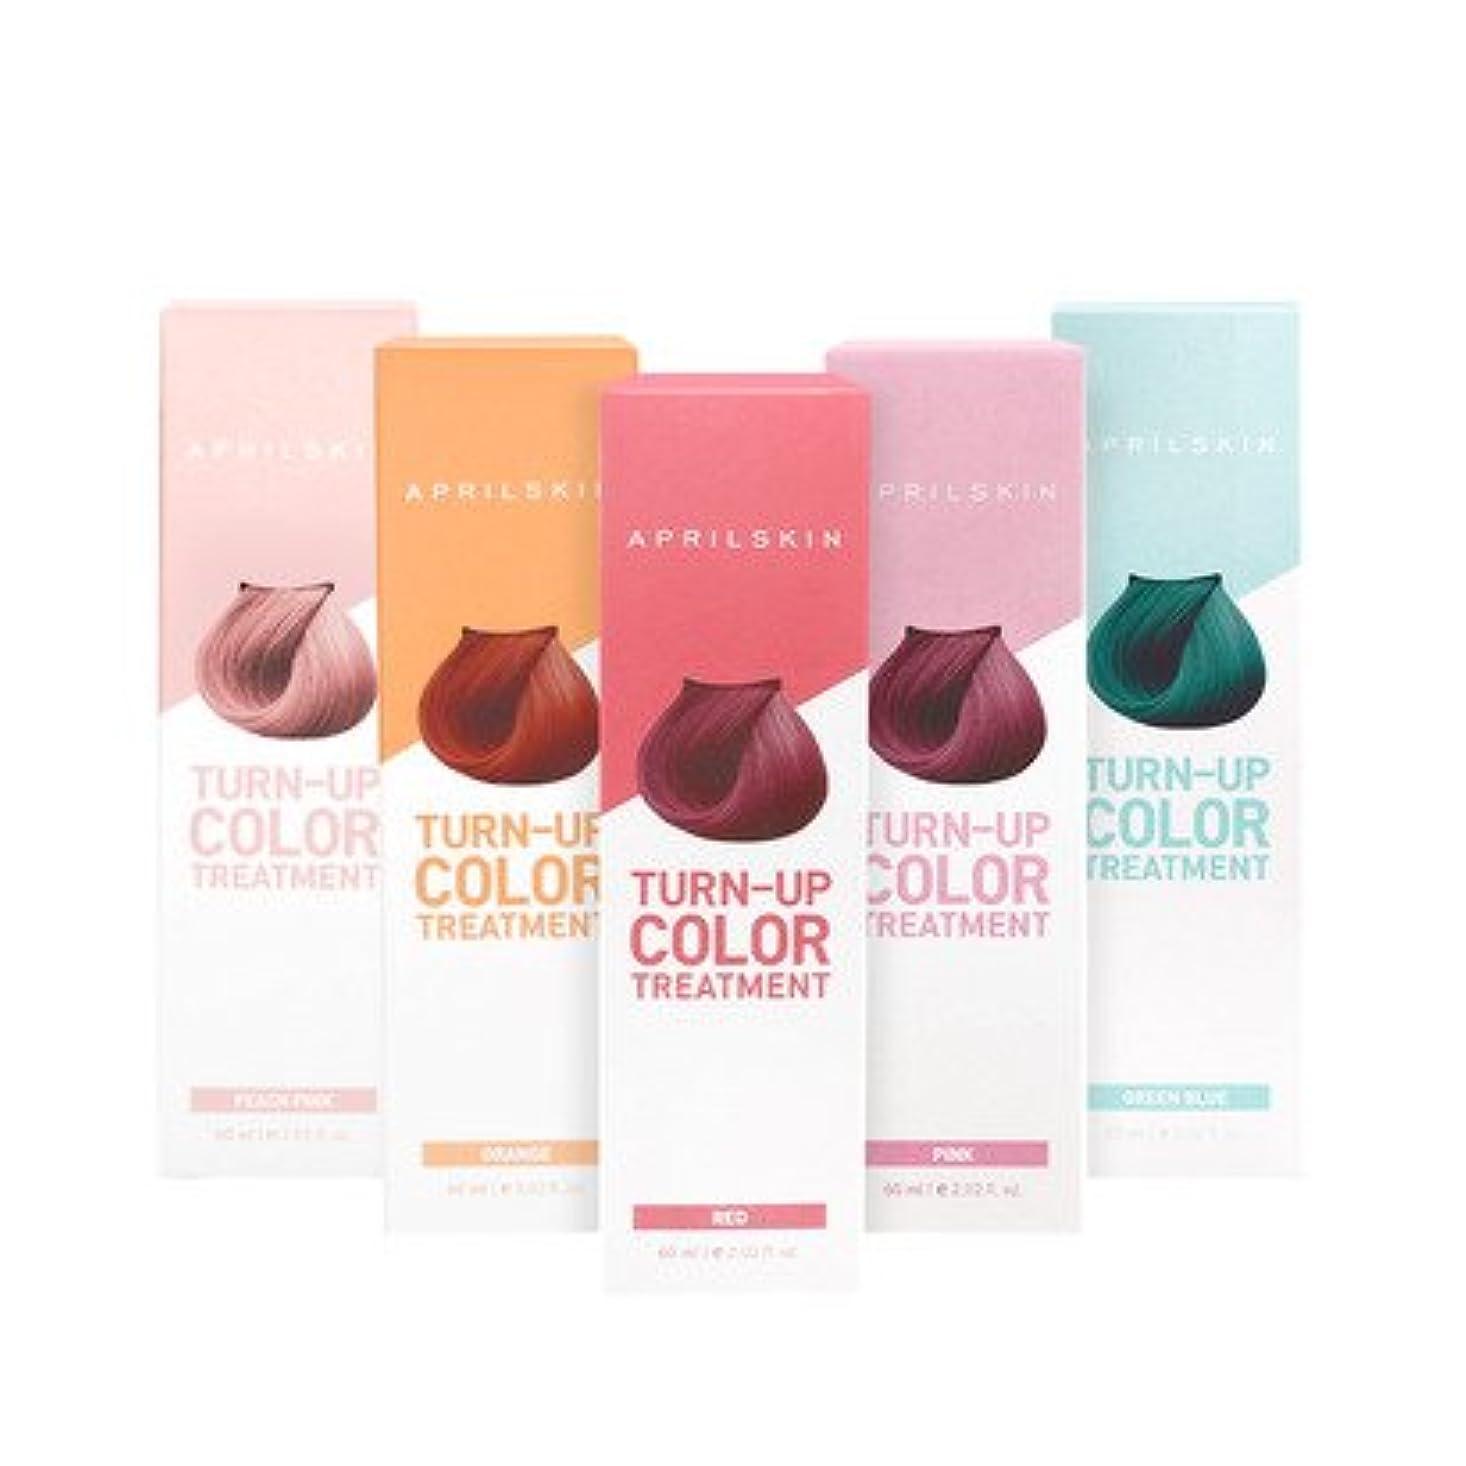 April Skin(エイプリルスキン) ターンアップカラー トリートメント/Turn up Color Treatment 60ml(レッド) [並行輸入品]